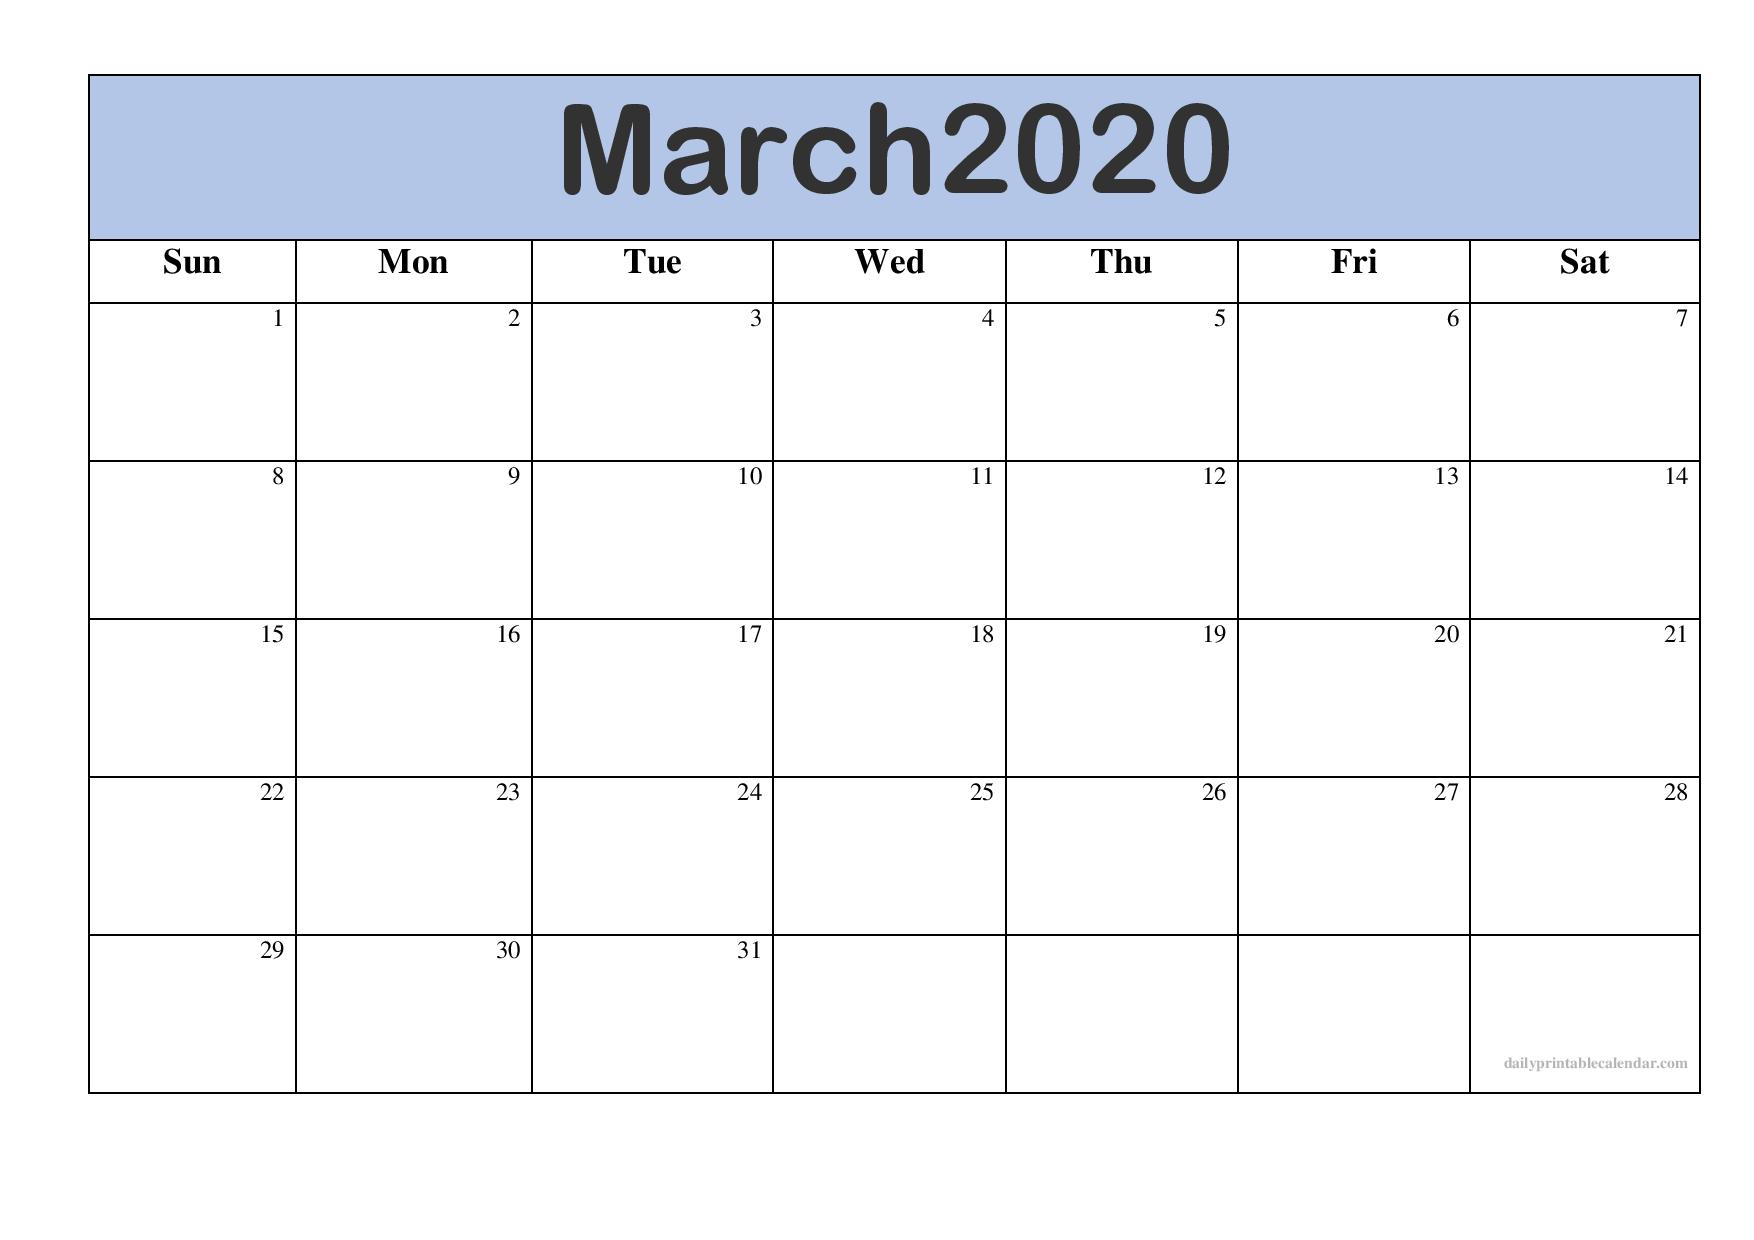 March 2020 Calendar Editable Template